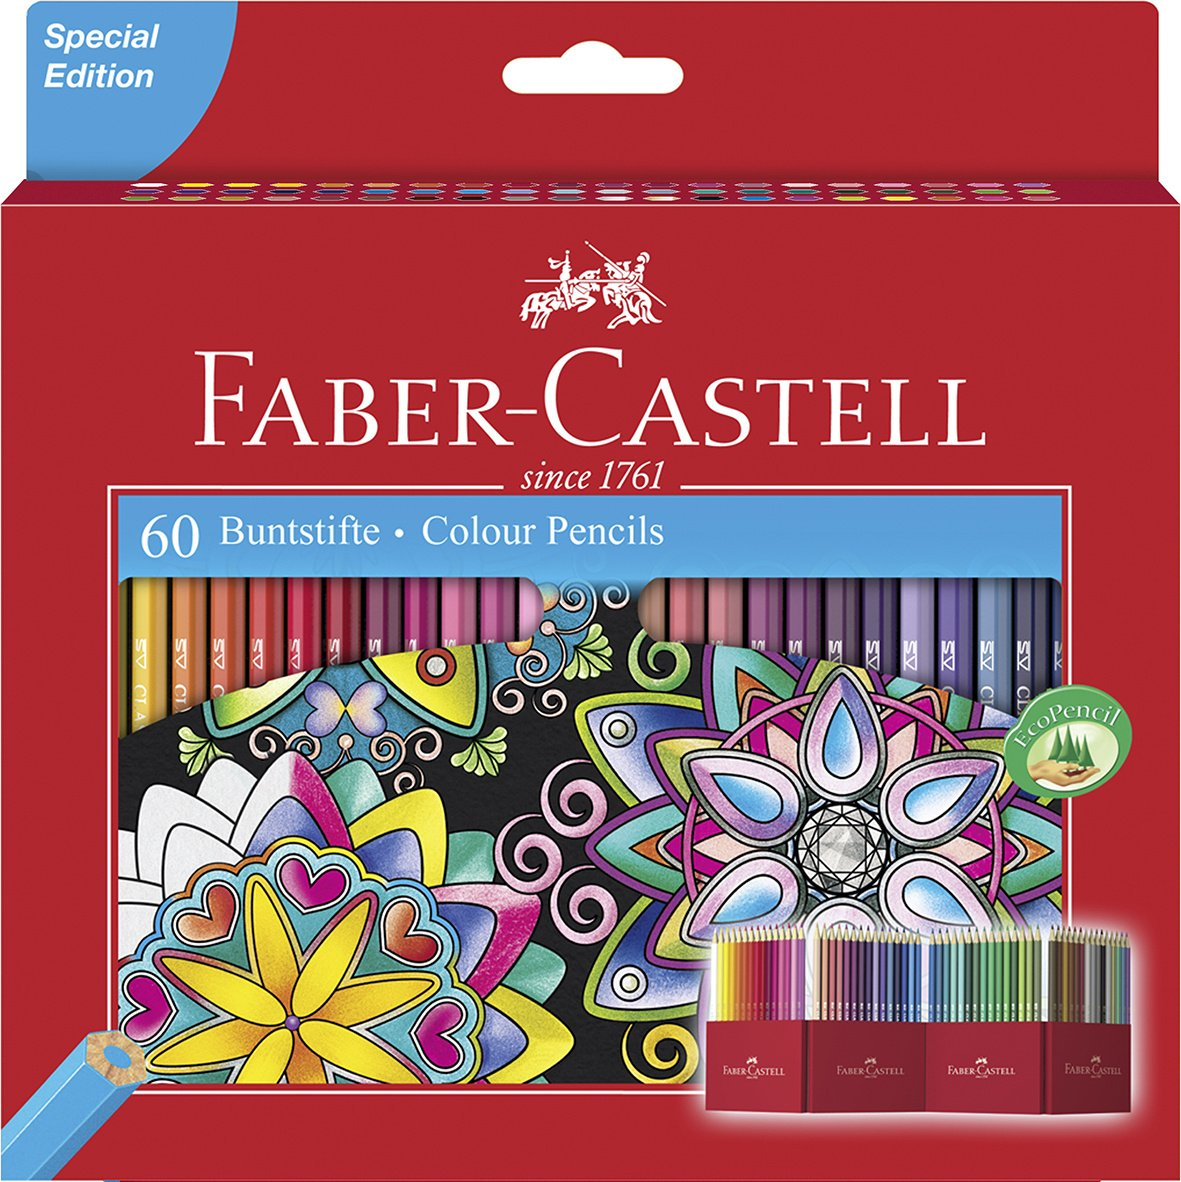 Faber Castell Estuche soporte de cartón con lápices de colores multicolor